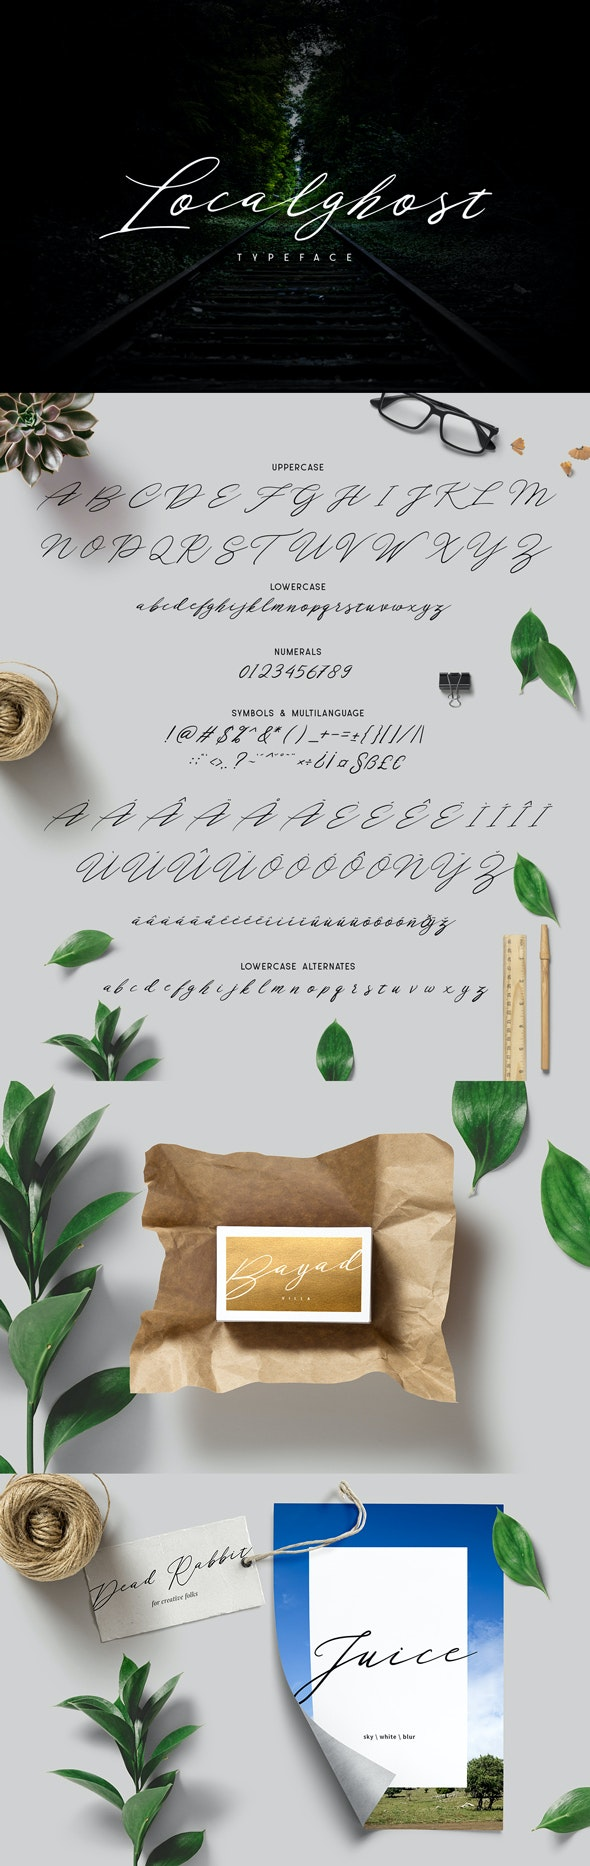 Localghost Typeface - Hand-writing Script